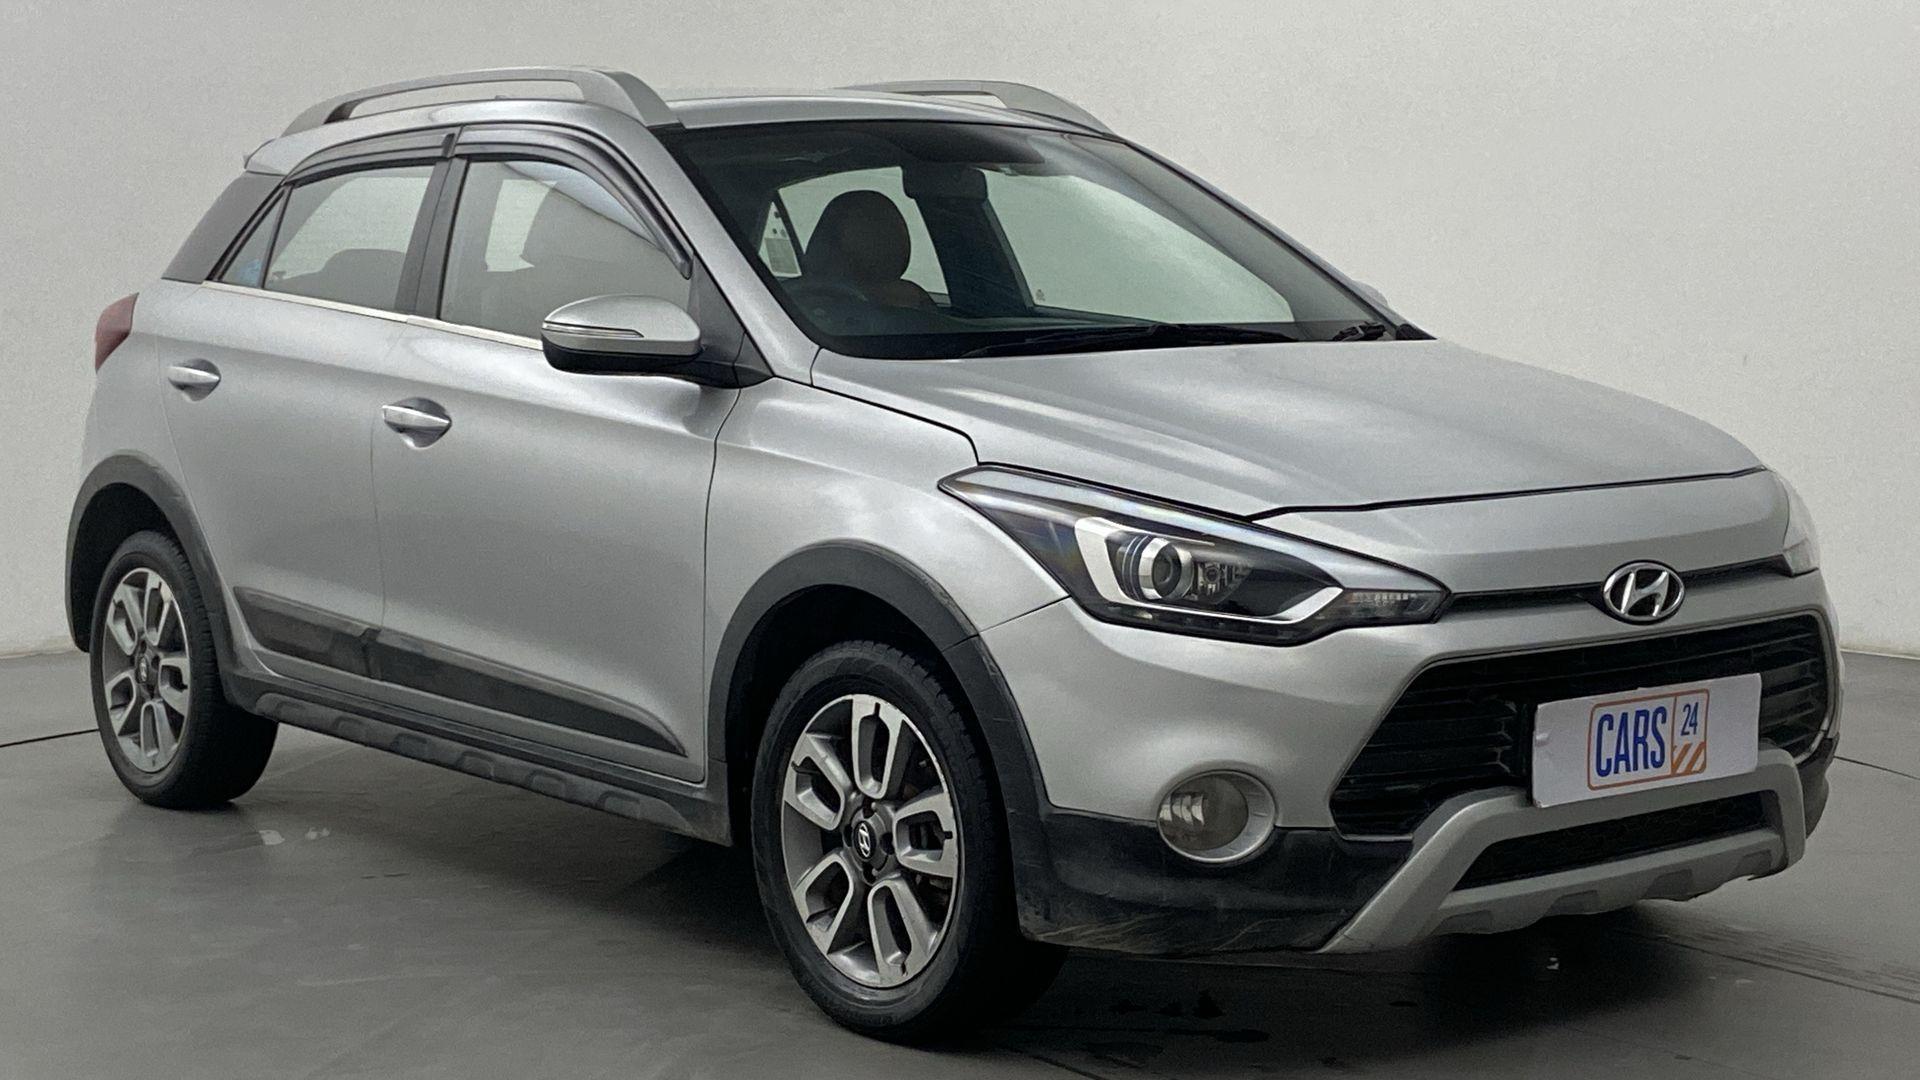 2018 Hyundai i20 Active 1.4 S